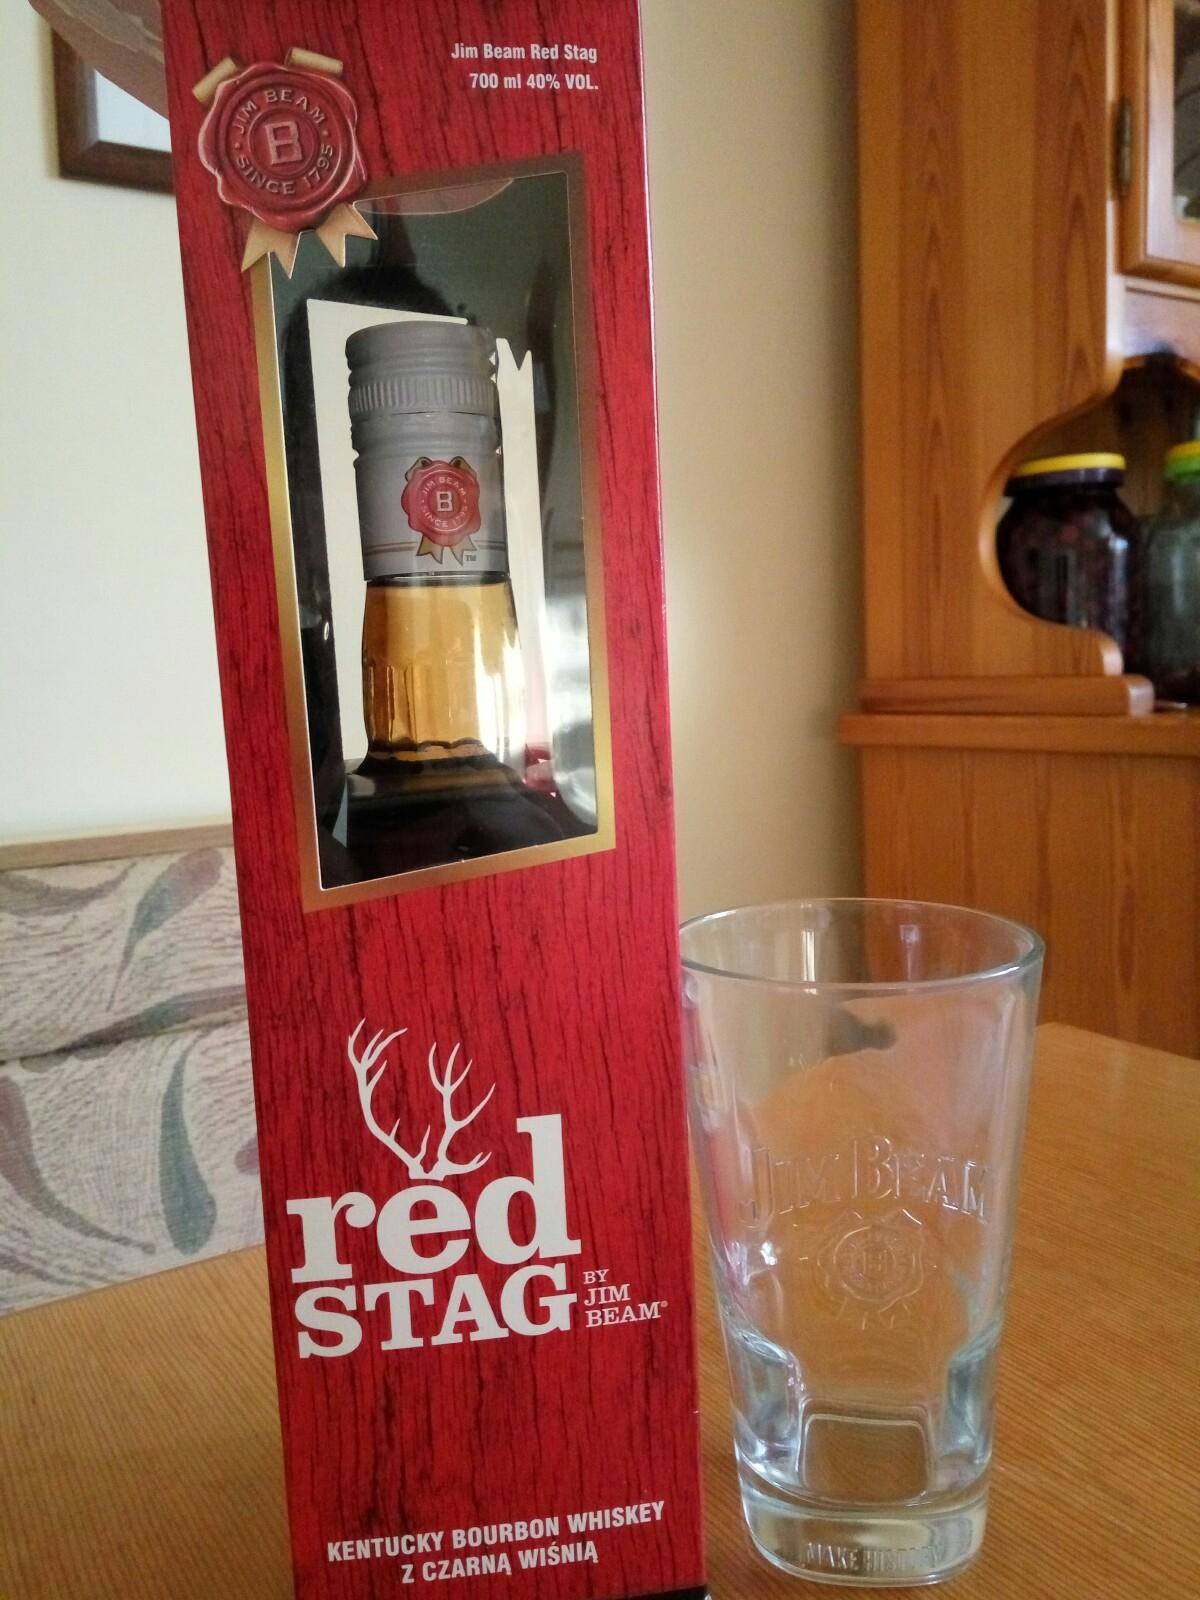 Jim Beam Red Stag 0,7 + szklanka Kaufland